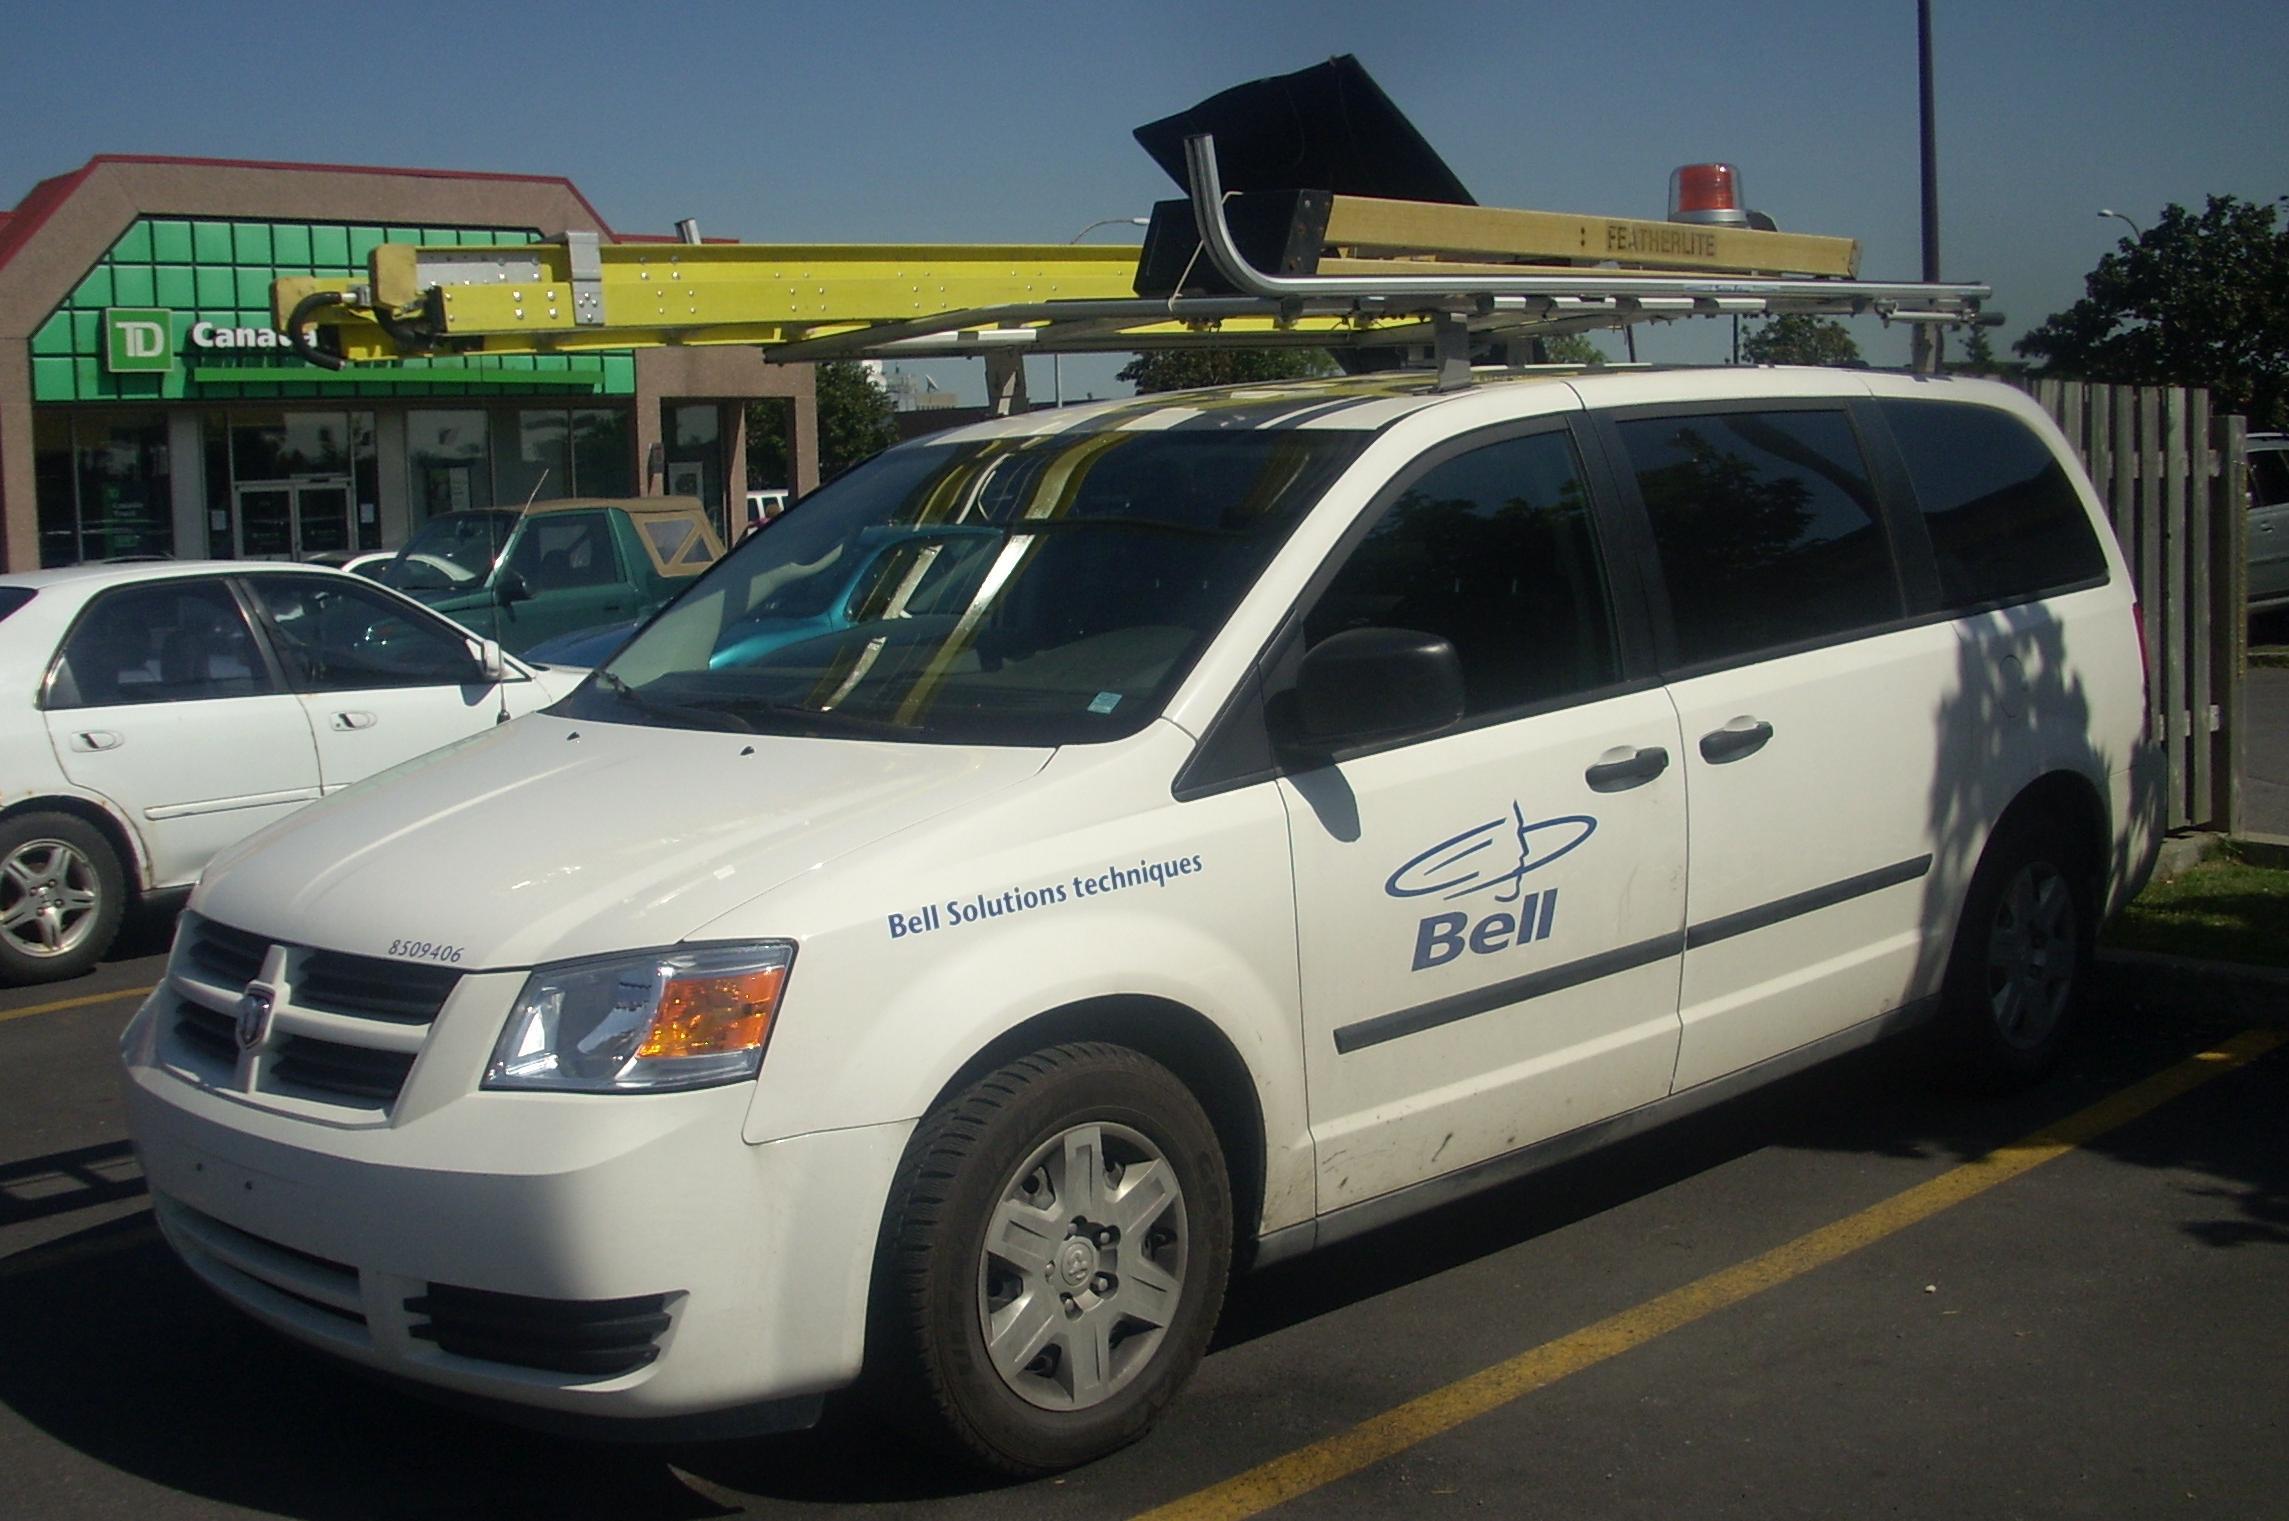 Service van with previous Bell Canada logo